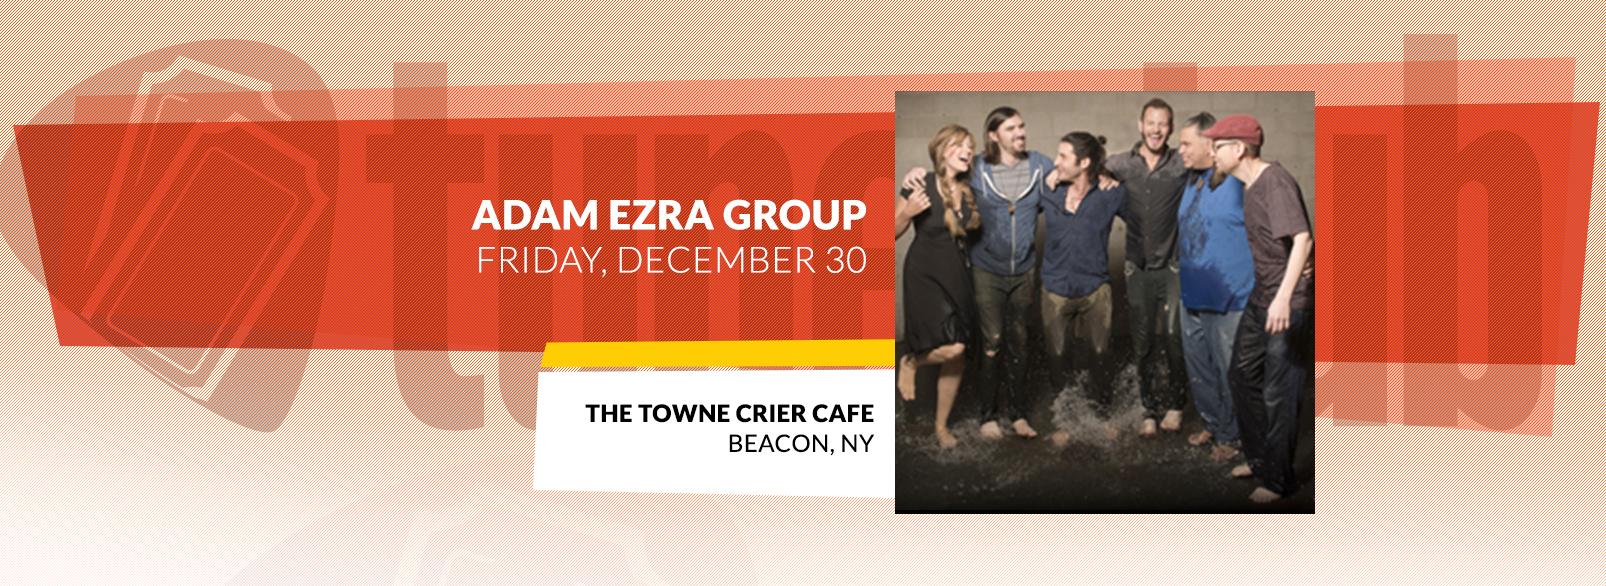 Adam Ezra Group @ The Towne Crier Cafe